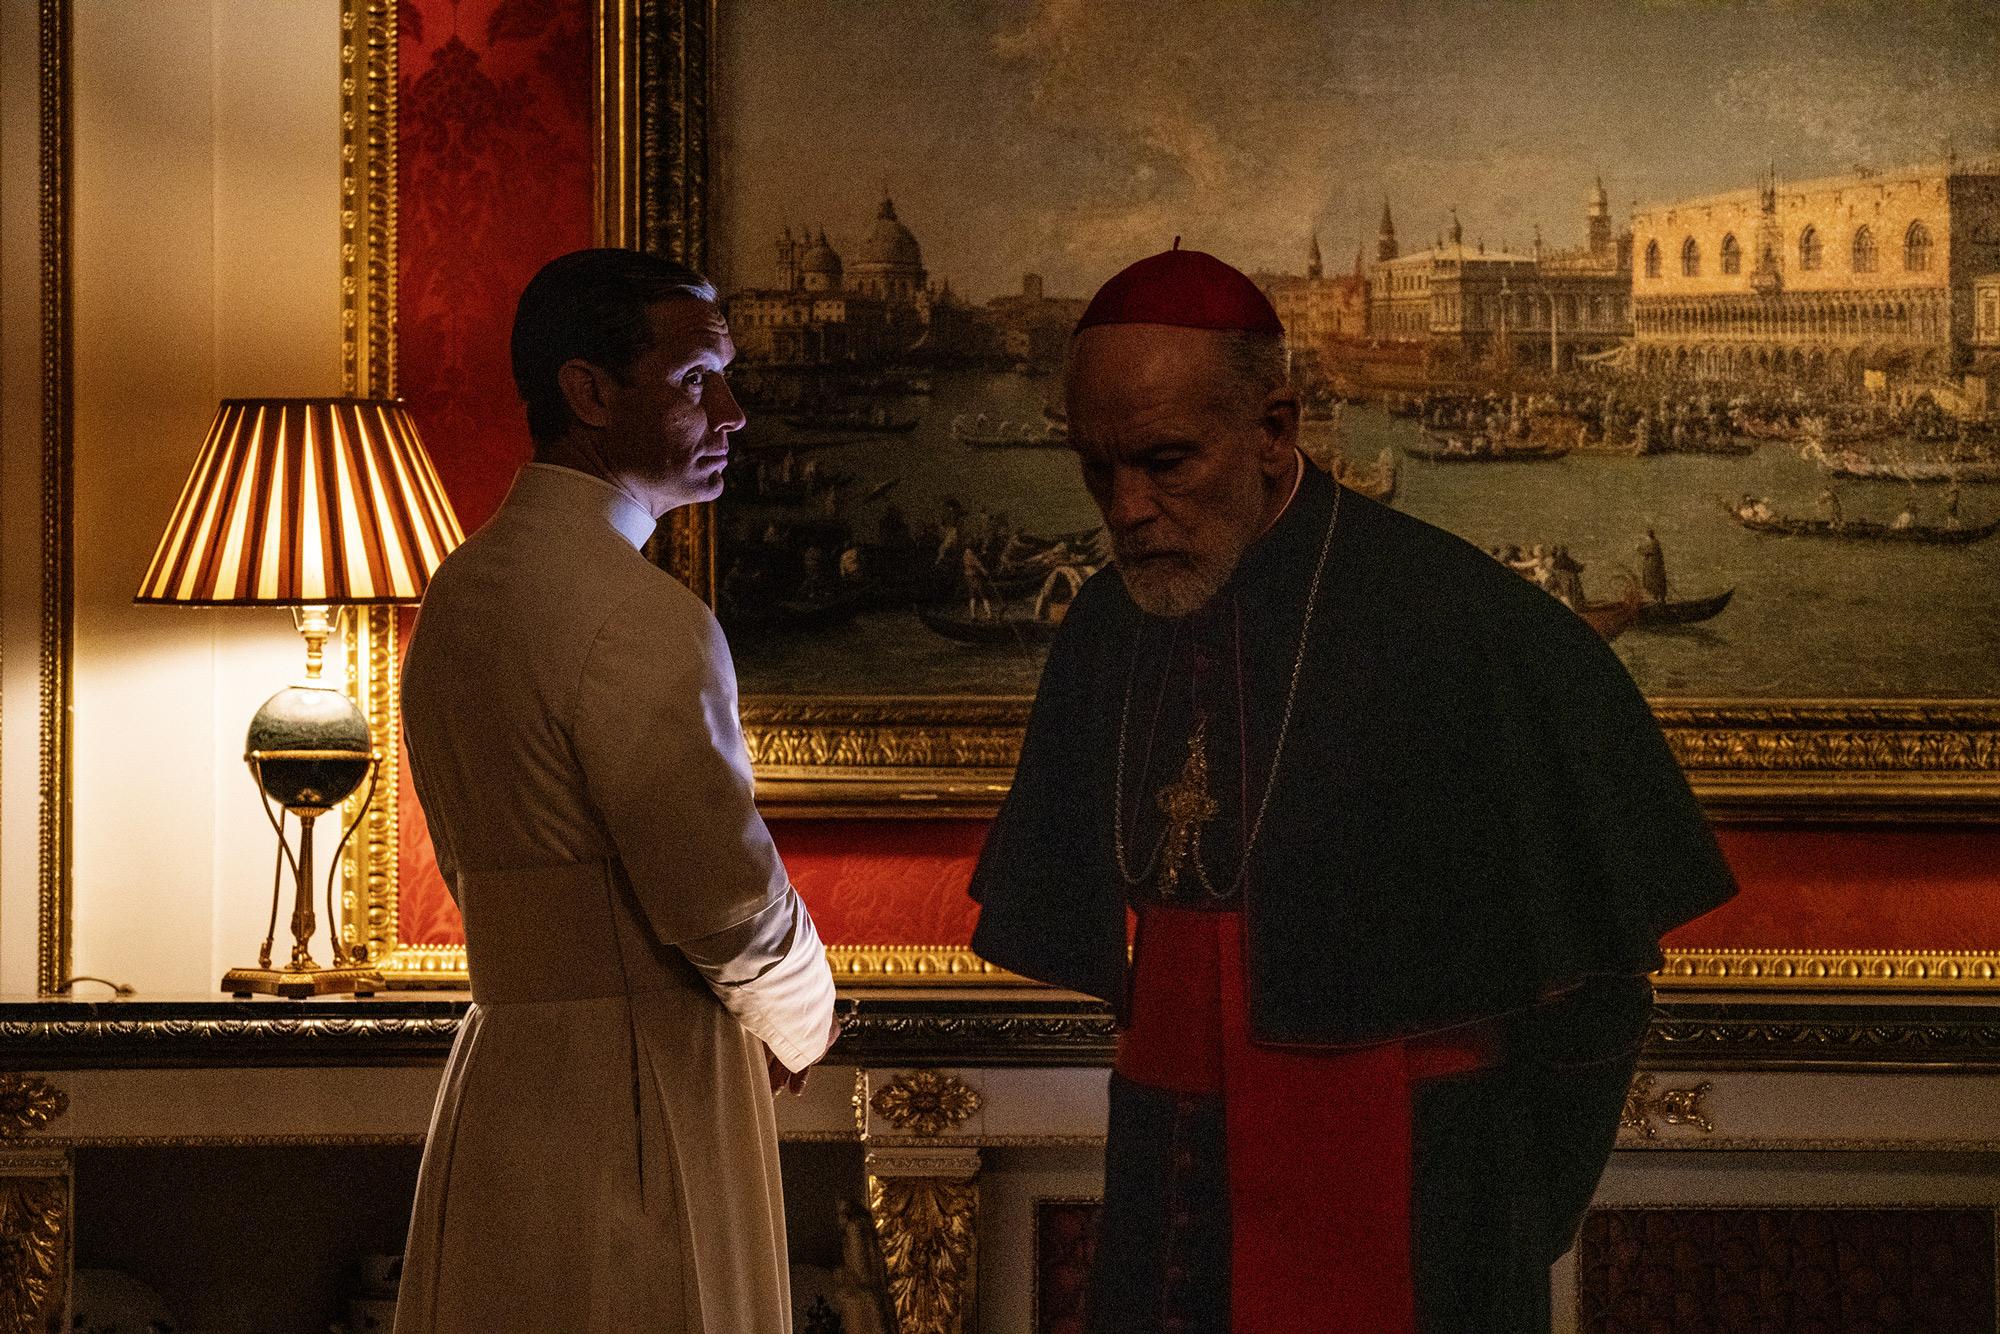 Nowy papież (serial TV)